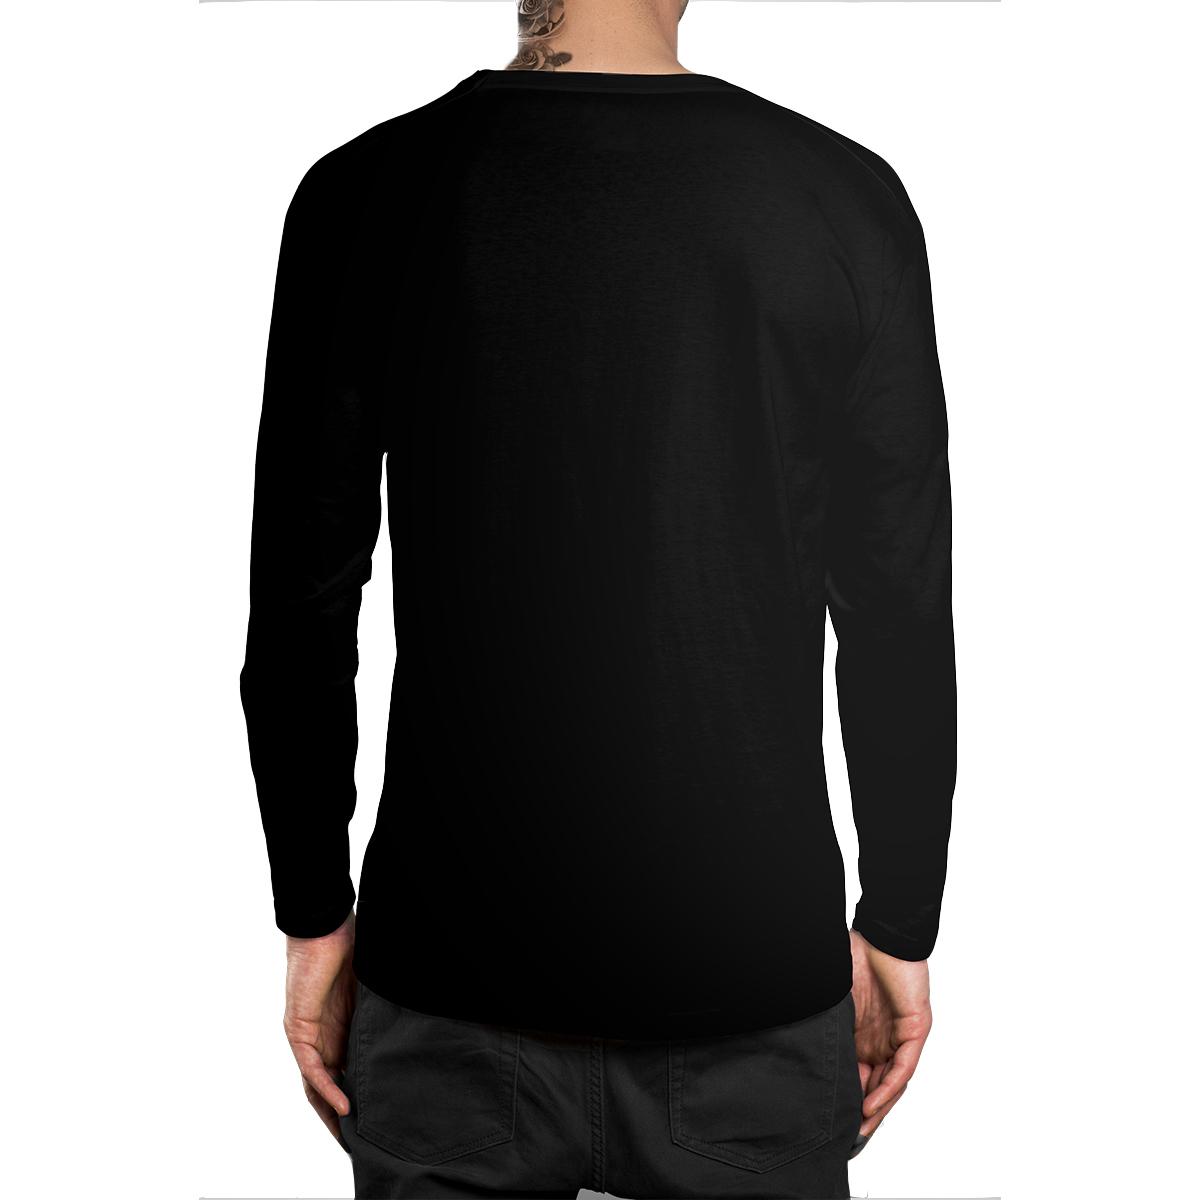 Stompy Camiseta Manga Longa Modelo 38